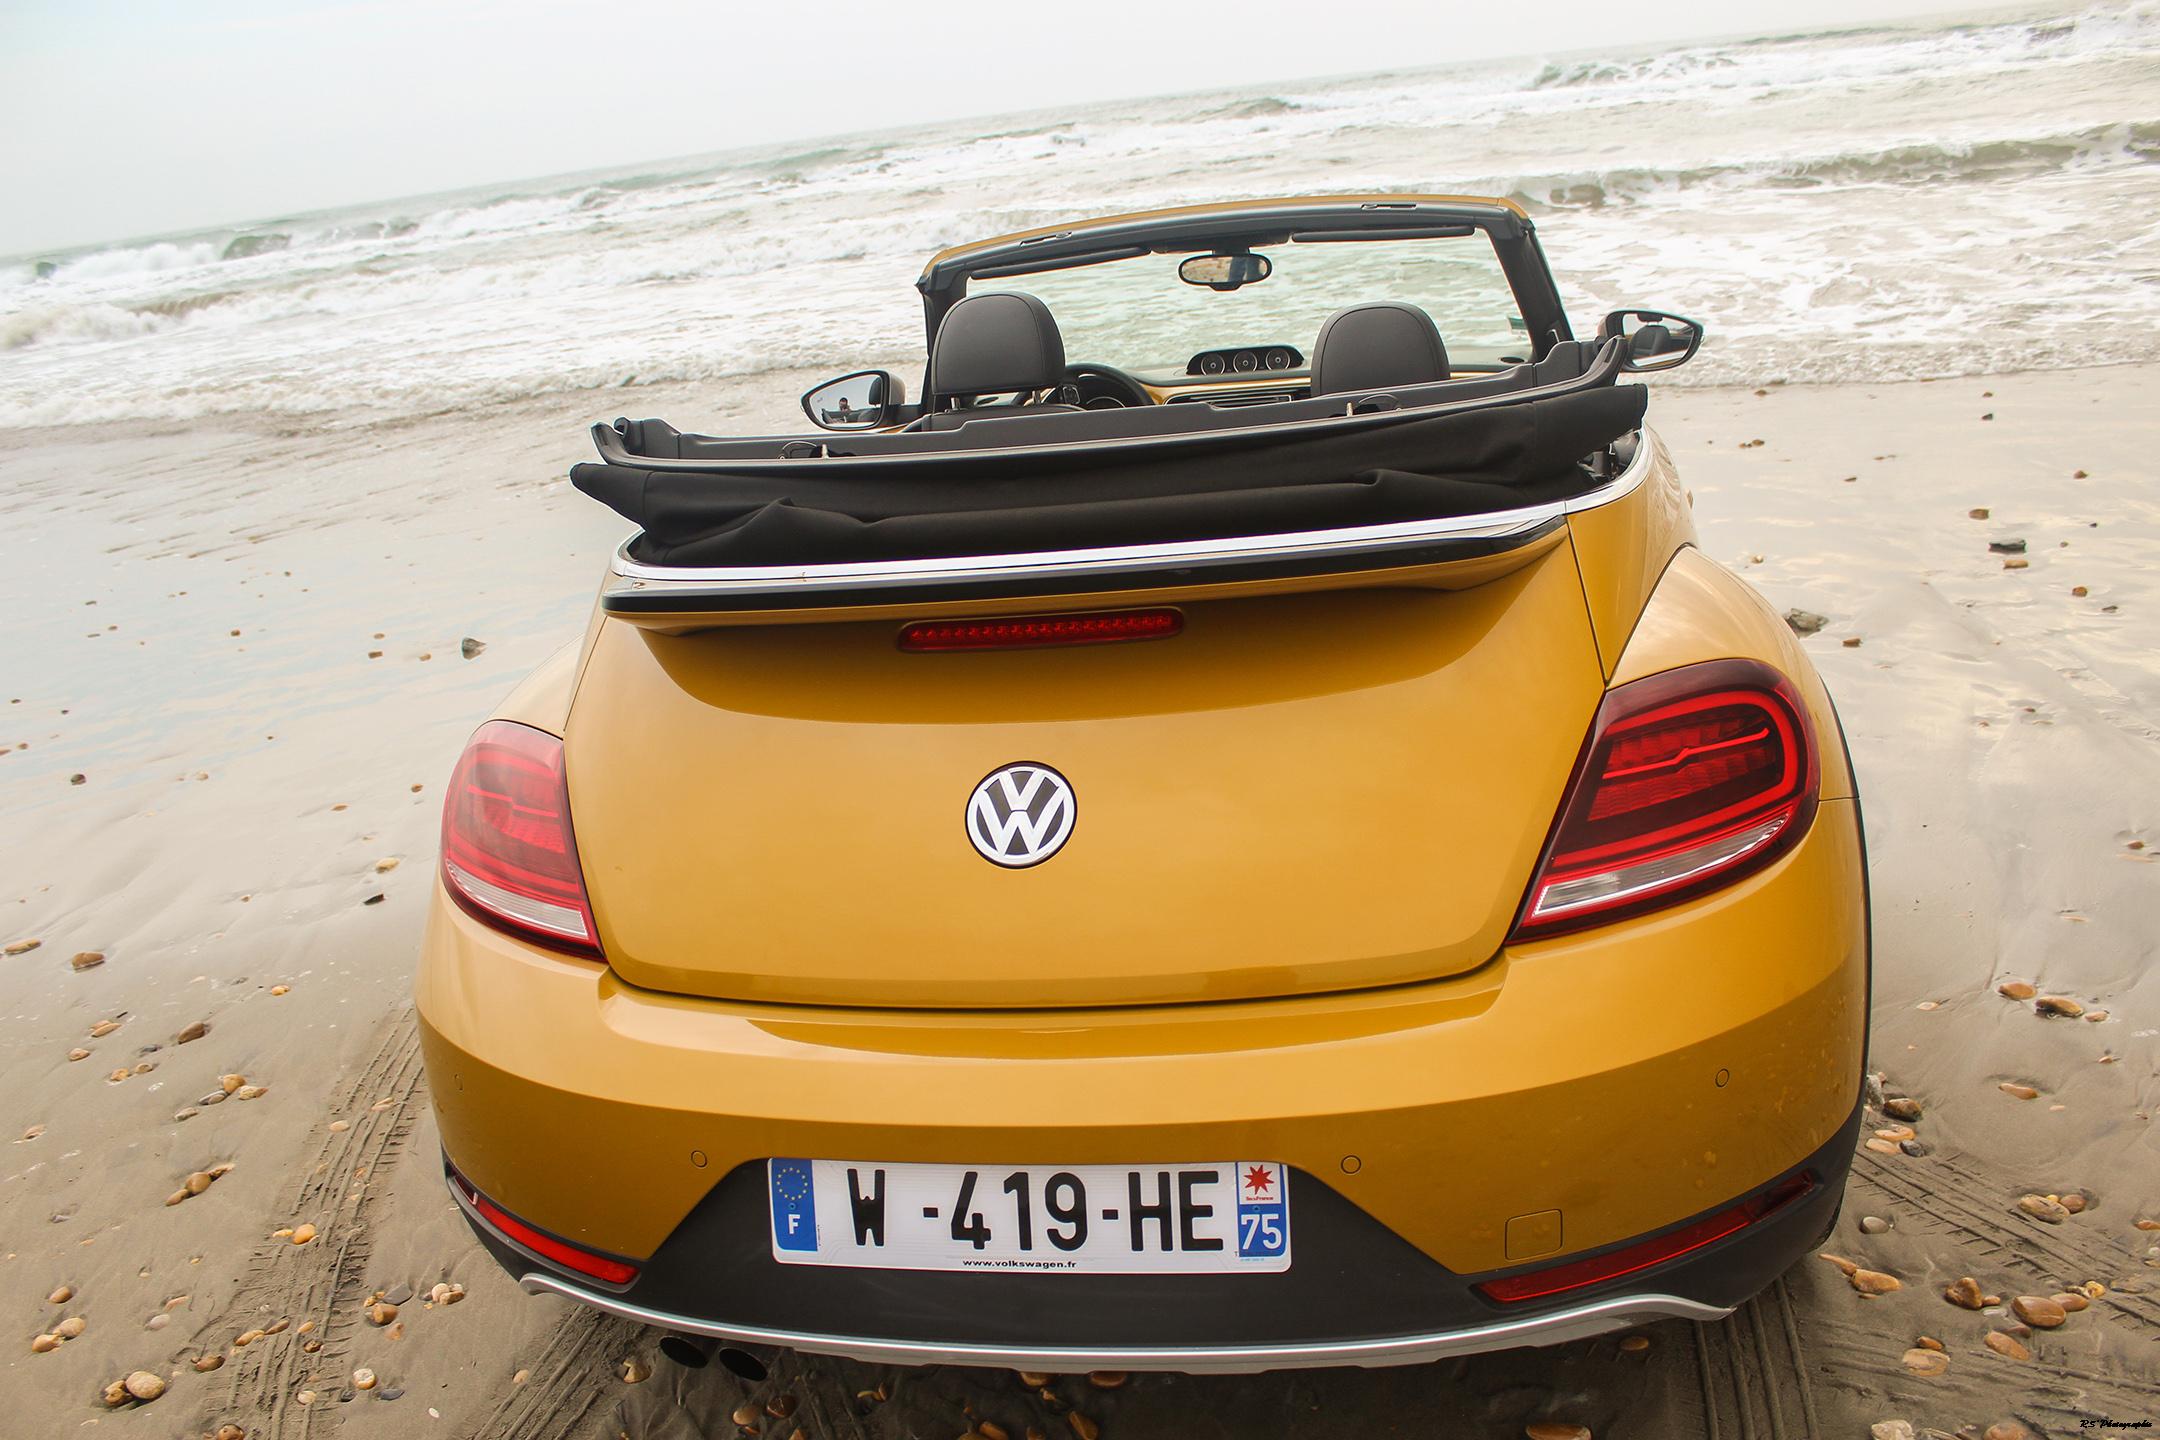 vwcox49-volkswagen-coccinelle-dune-cabriolet-arriere-rear-arnaud-demasier-rsphotographie